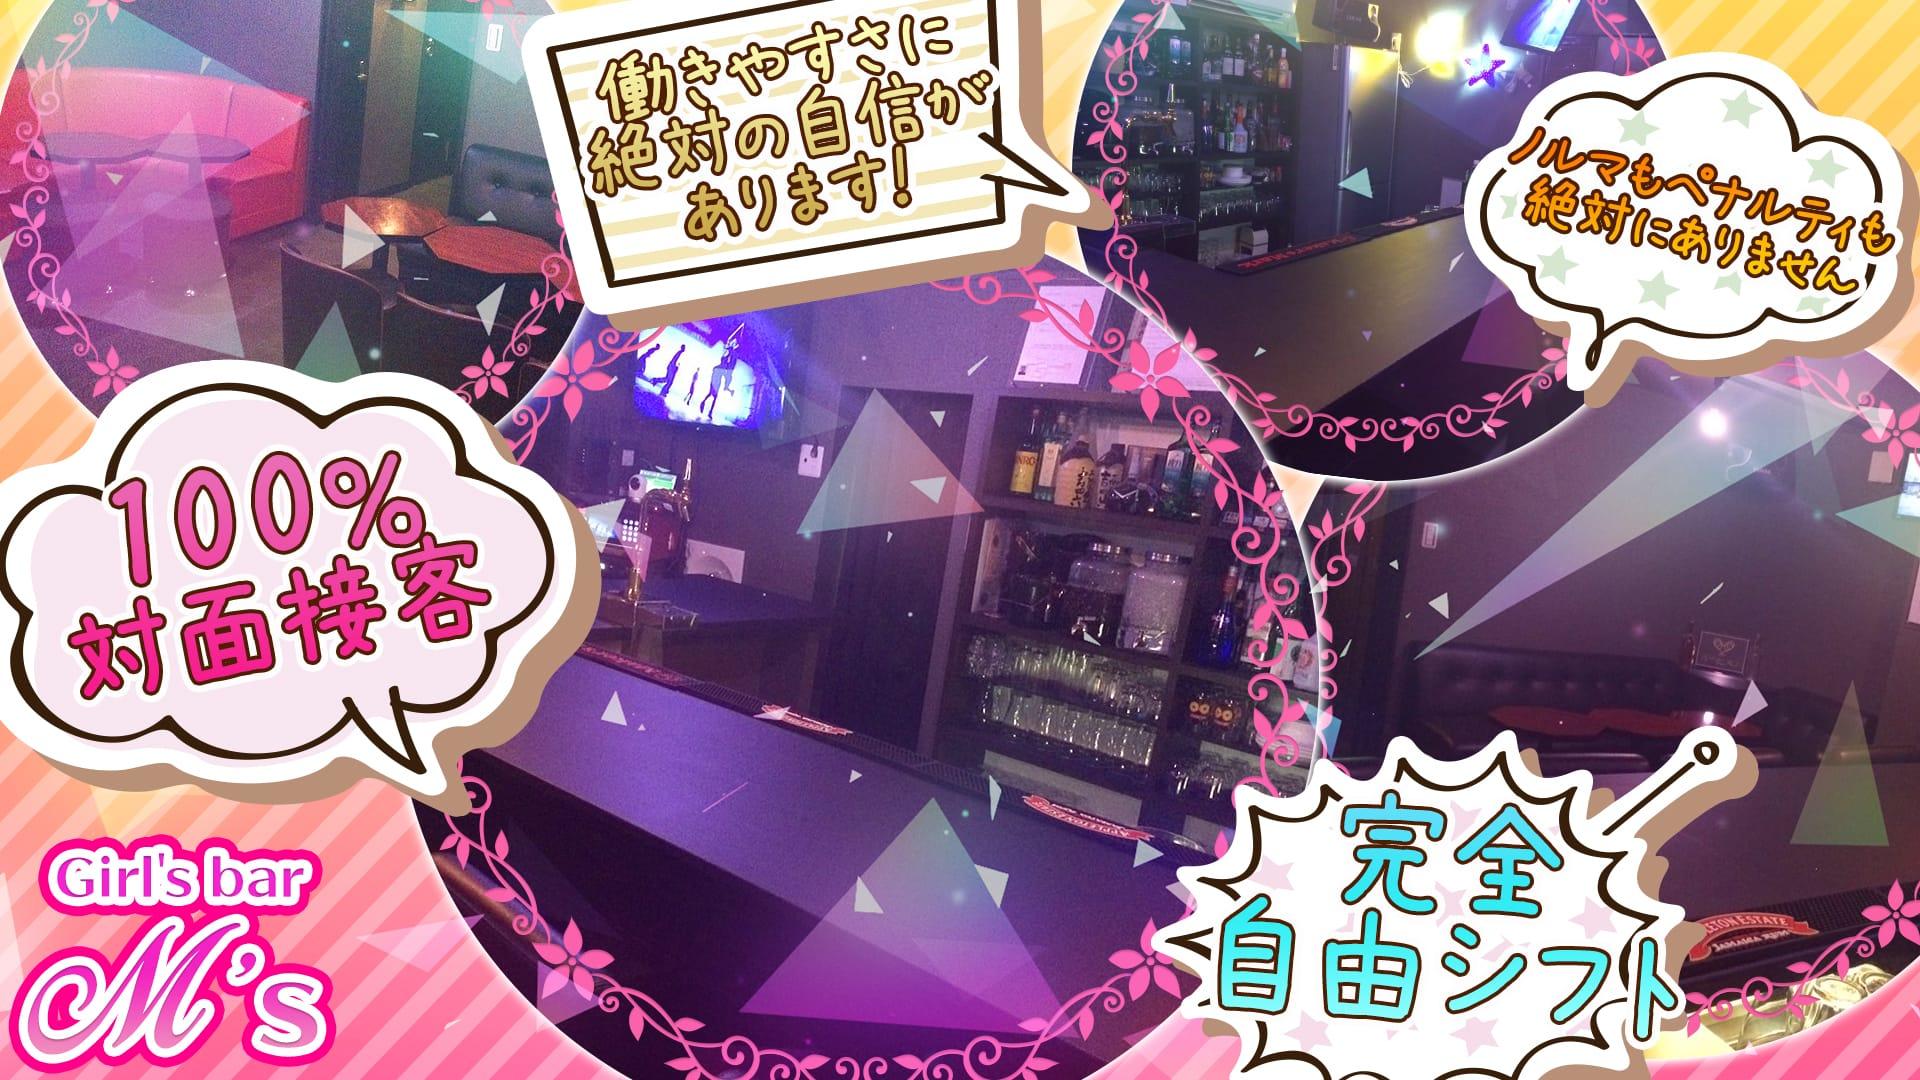 Girl's bar M's <エムズ> 大宮 ガールズバー TOP画像